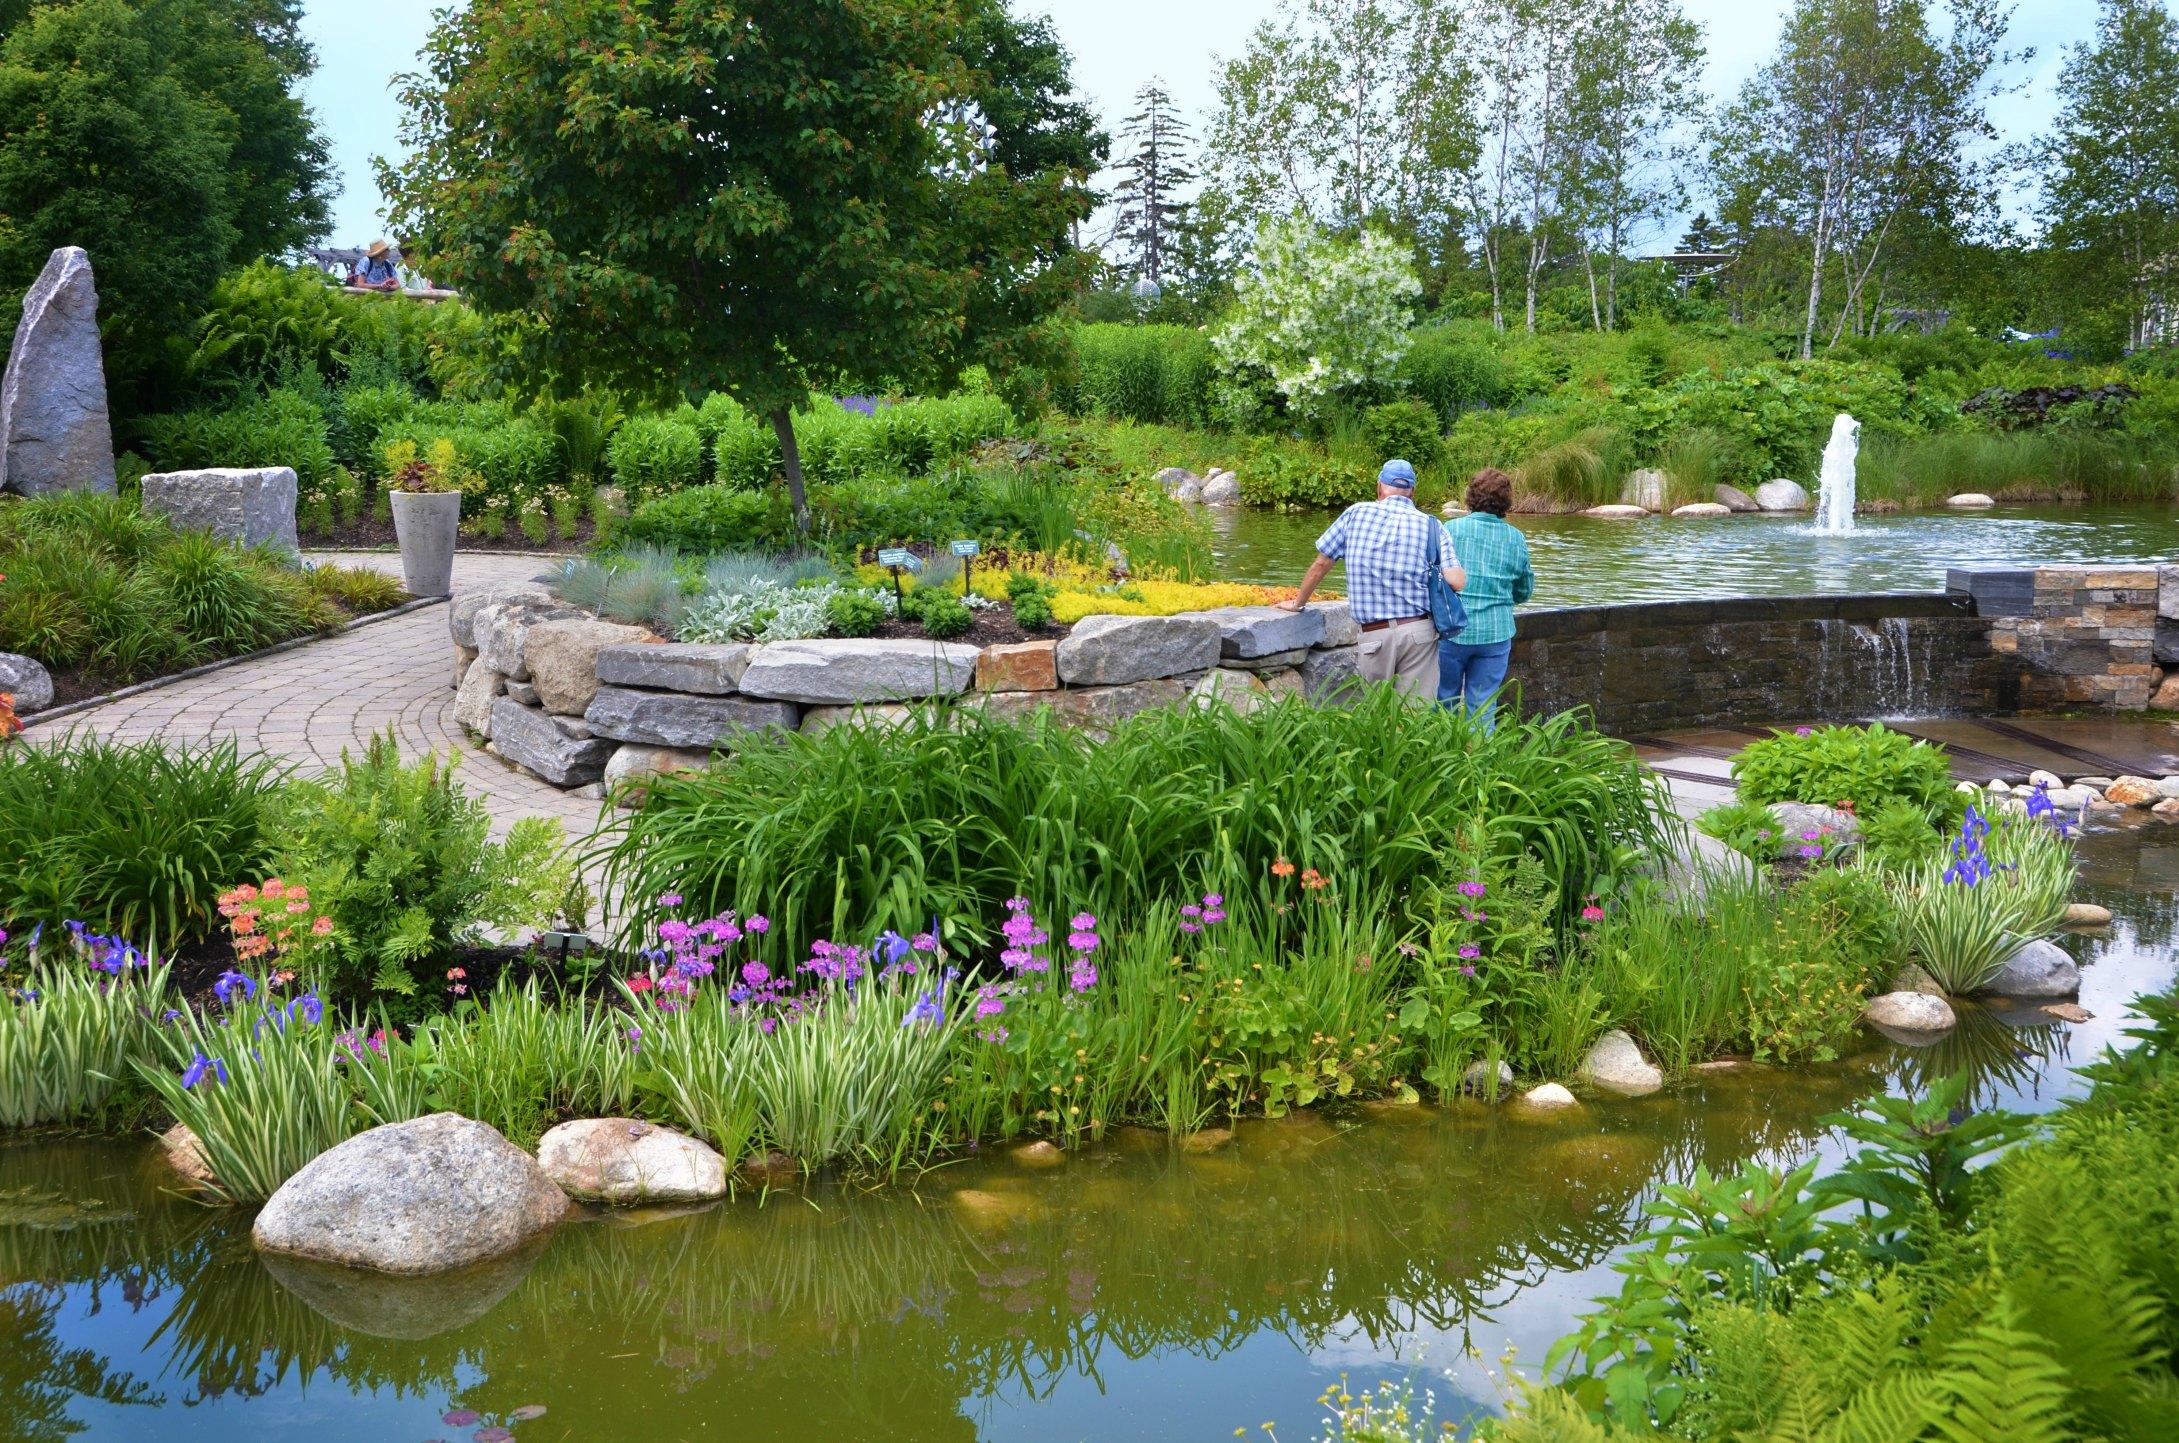 In the Lerner Garden